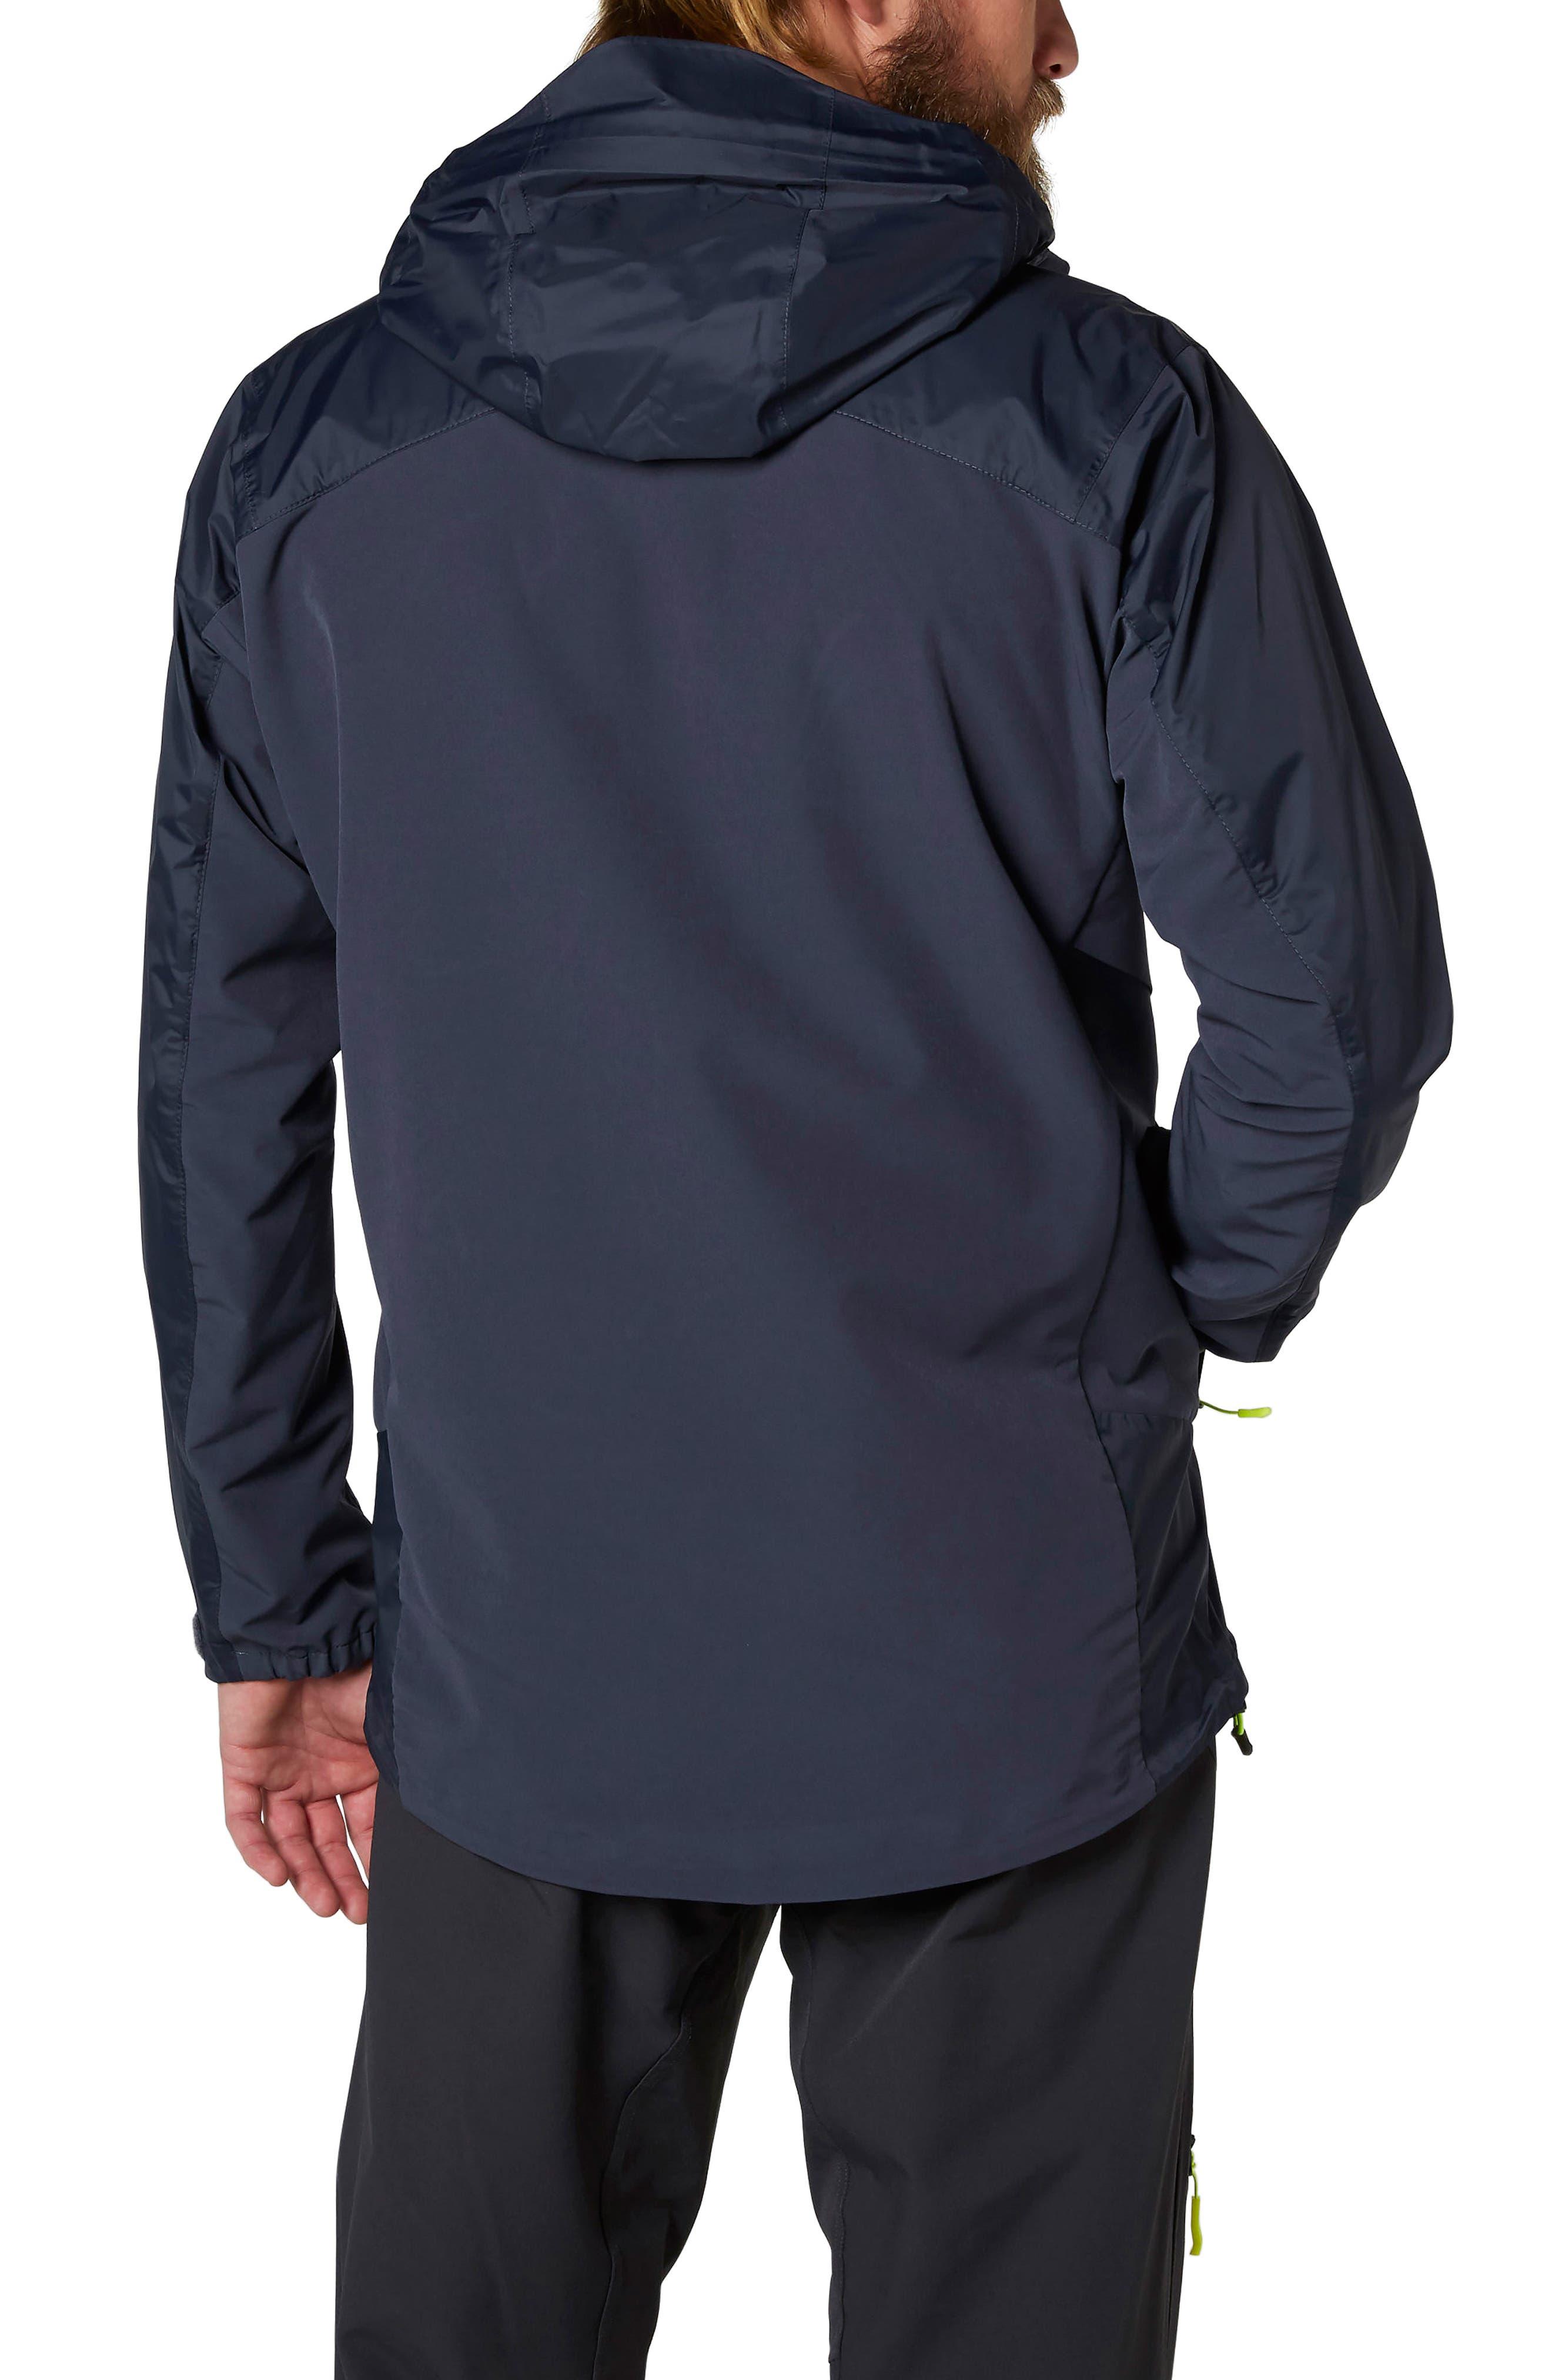 Vanir Logr Regular Fit Waterproof Jacket,                             Alternate thumbnail 4, color,